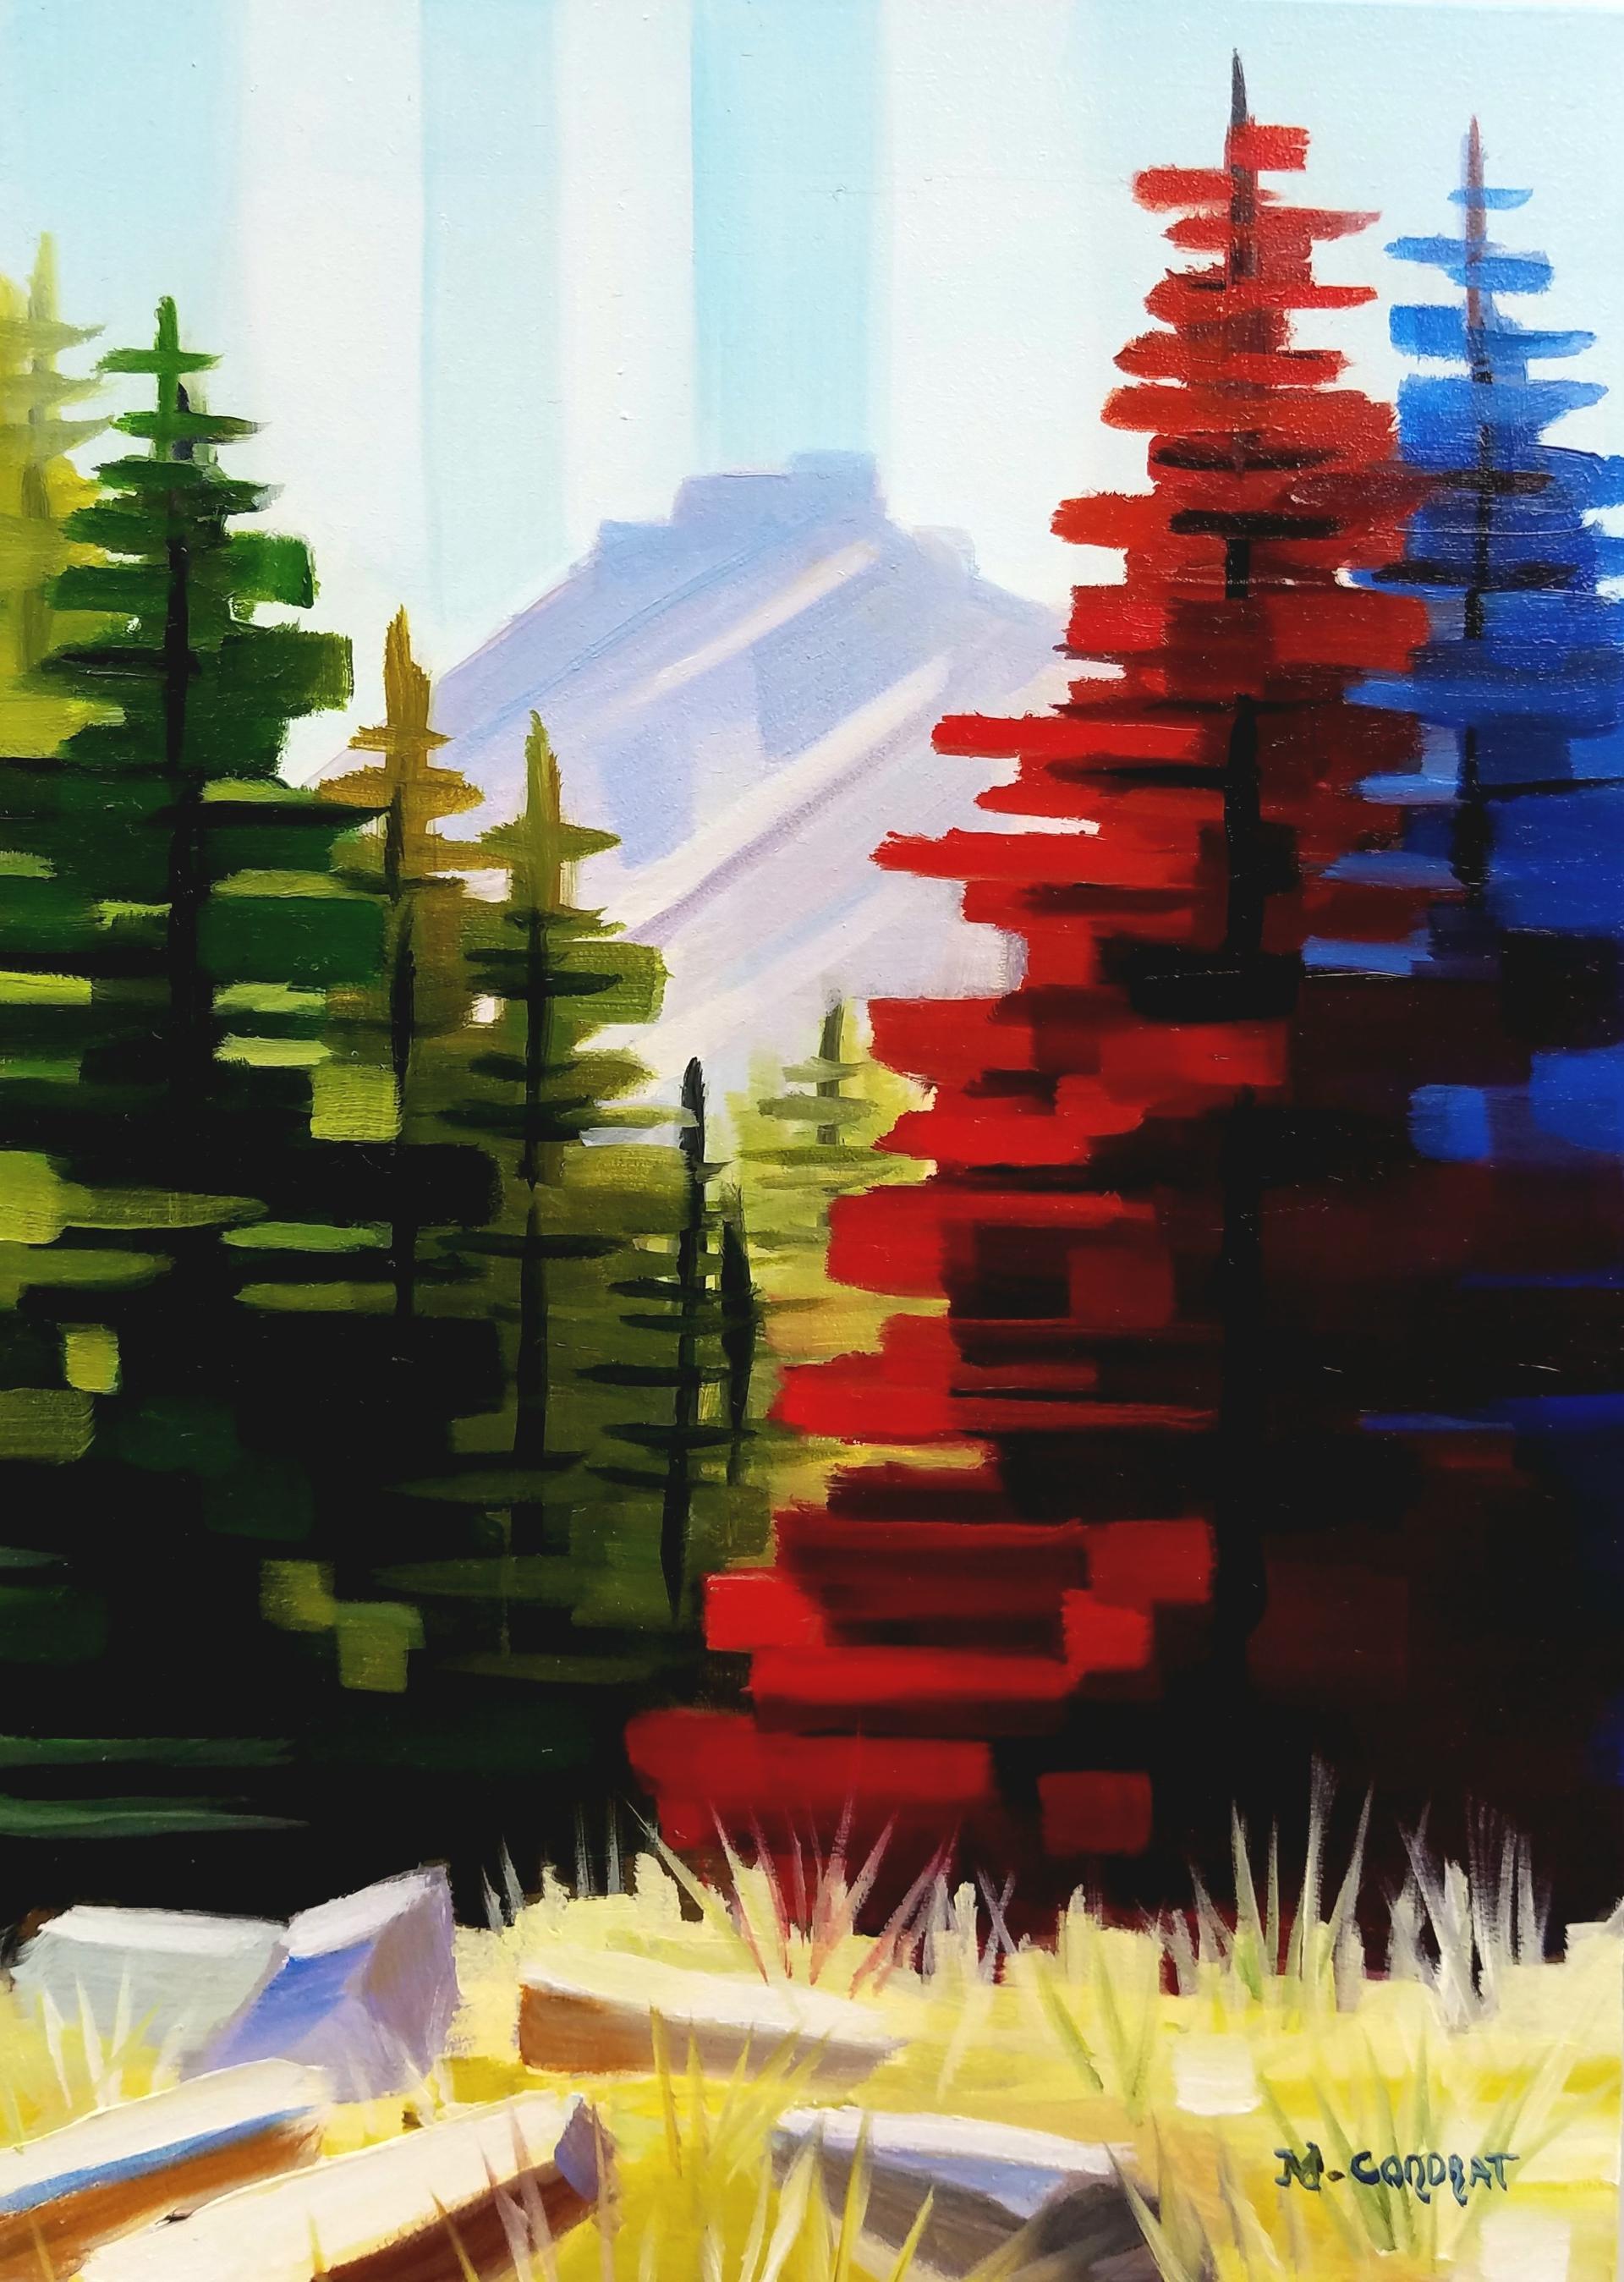 Solitude Pines by Michelle Condrat